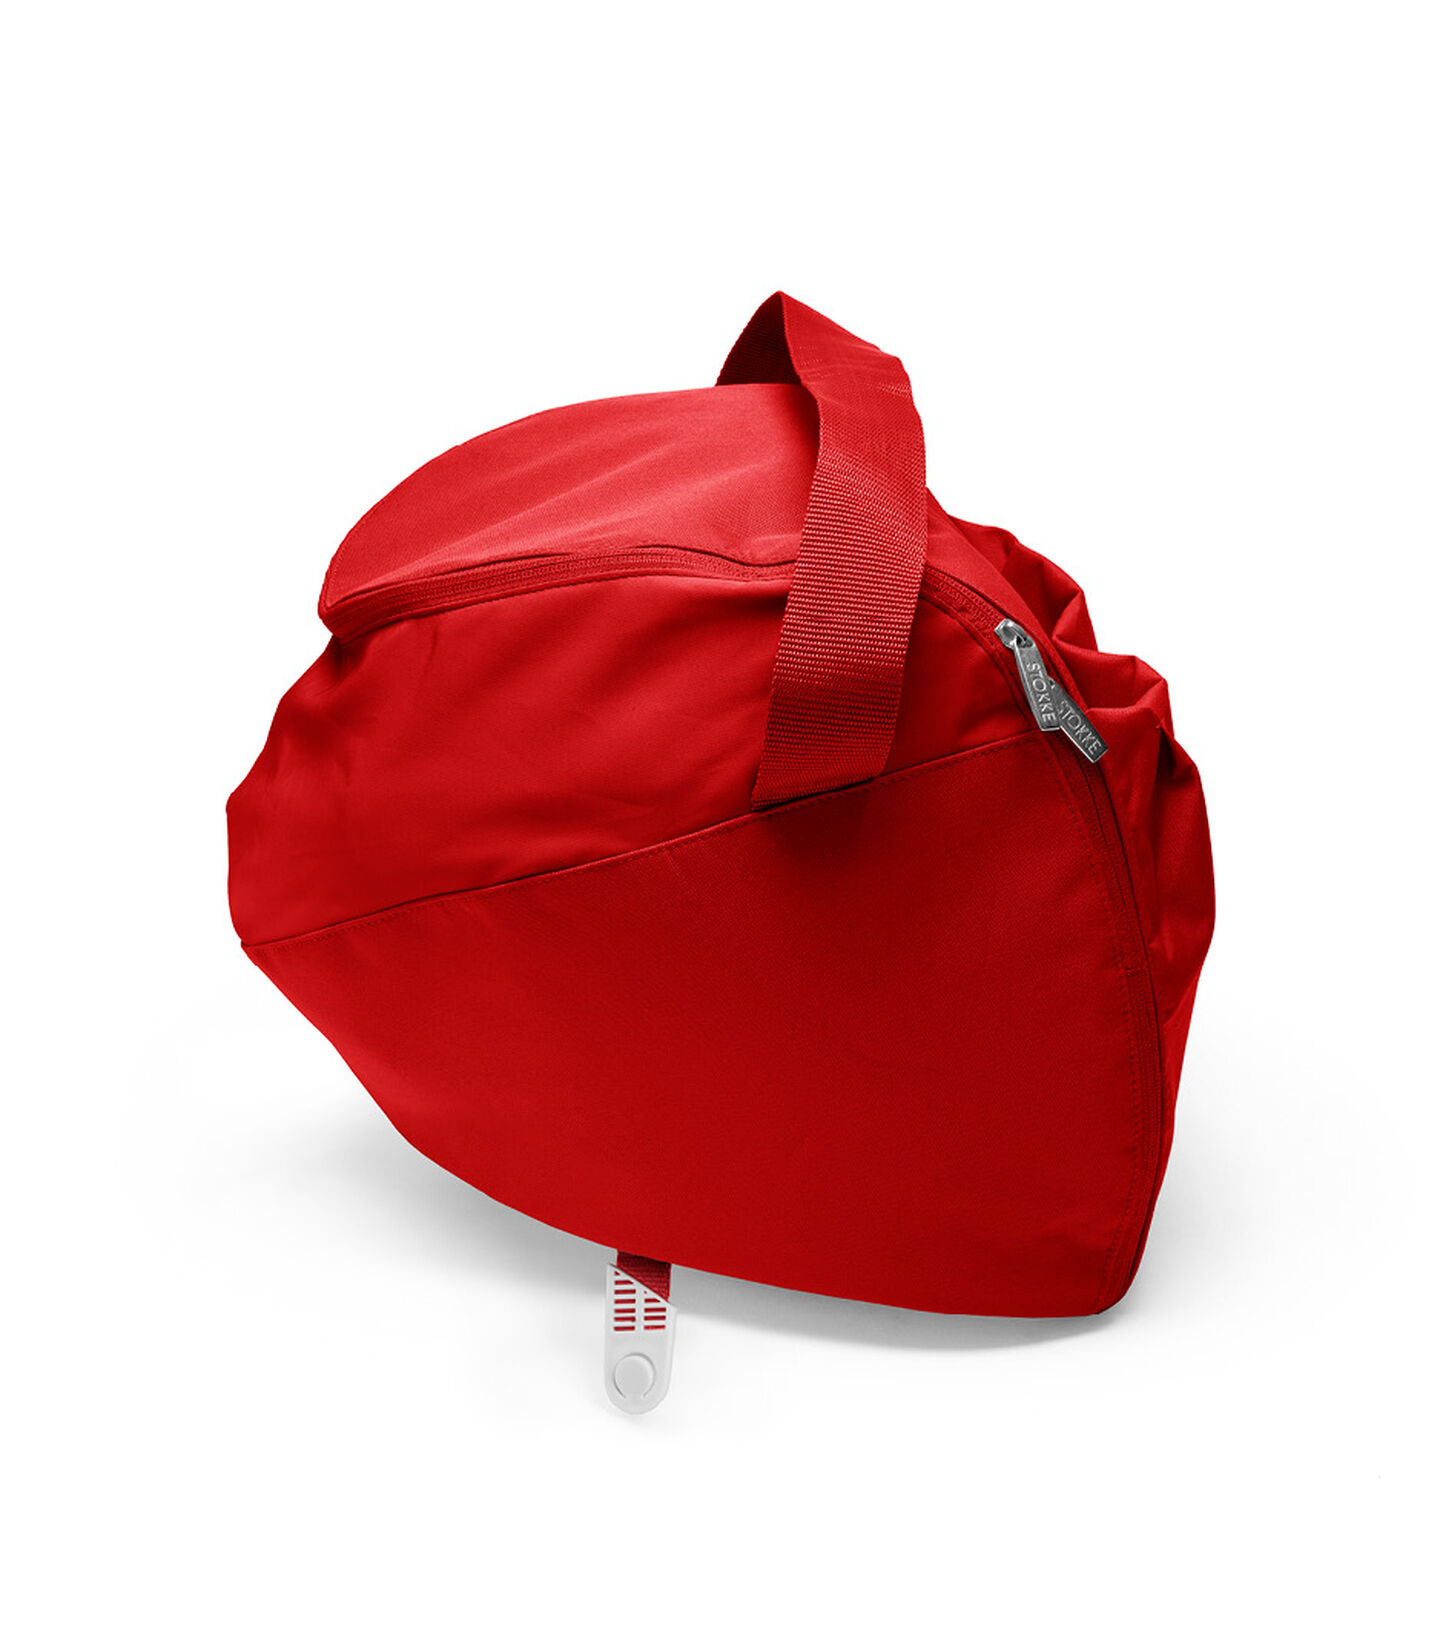 Stokke® Xplory® - Torba na zakupy Red, Red, mainview view 2